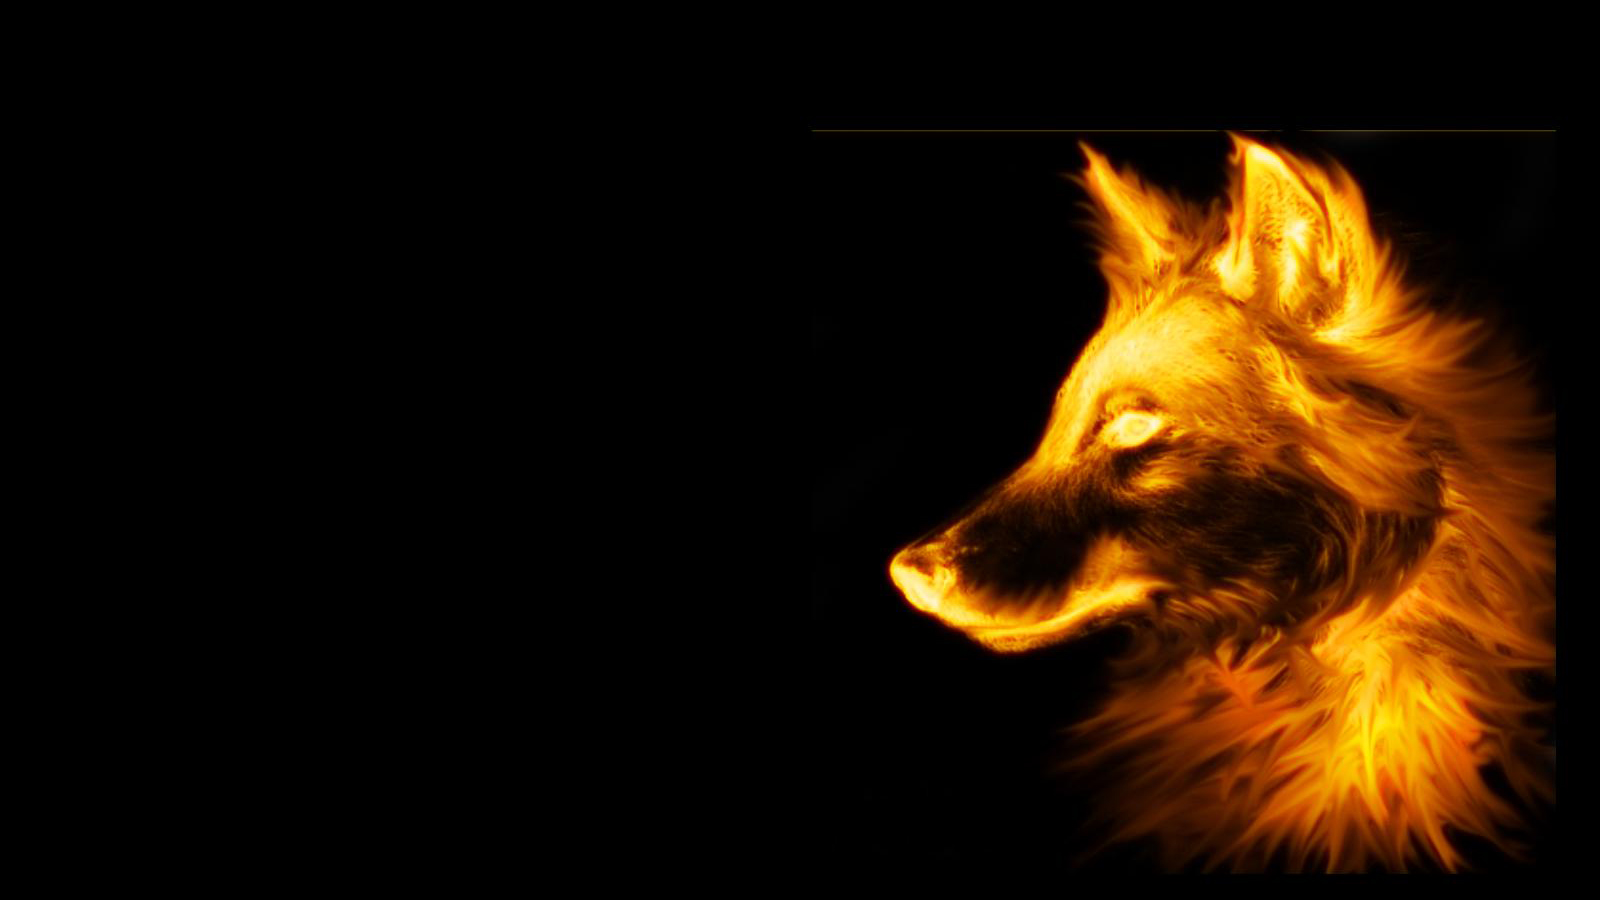 3d Fox Wallpaper Hd Fire Wolf Black Background 1600x900 Wallpaper Teahub Io